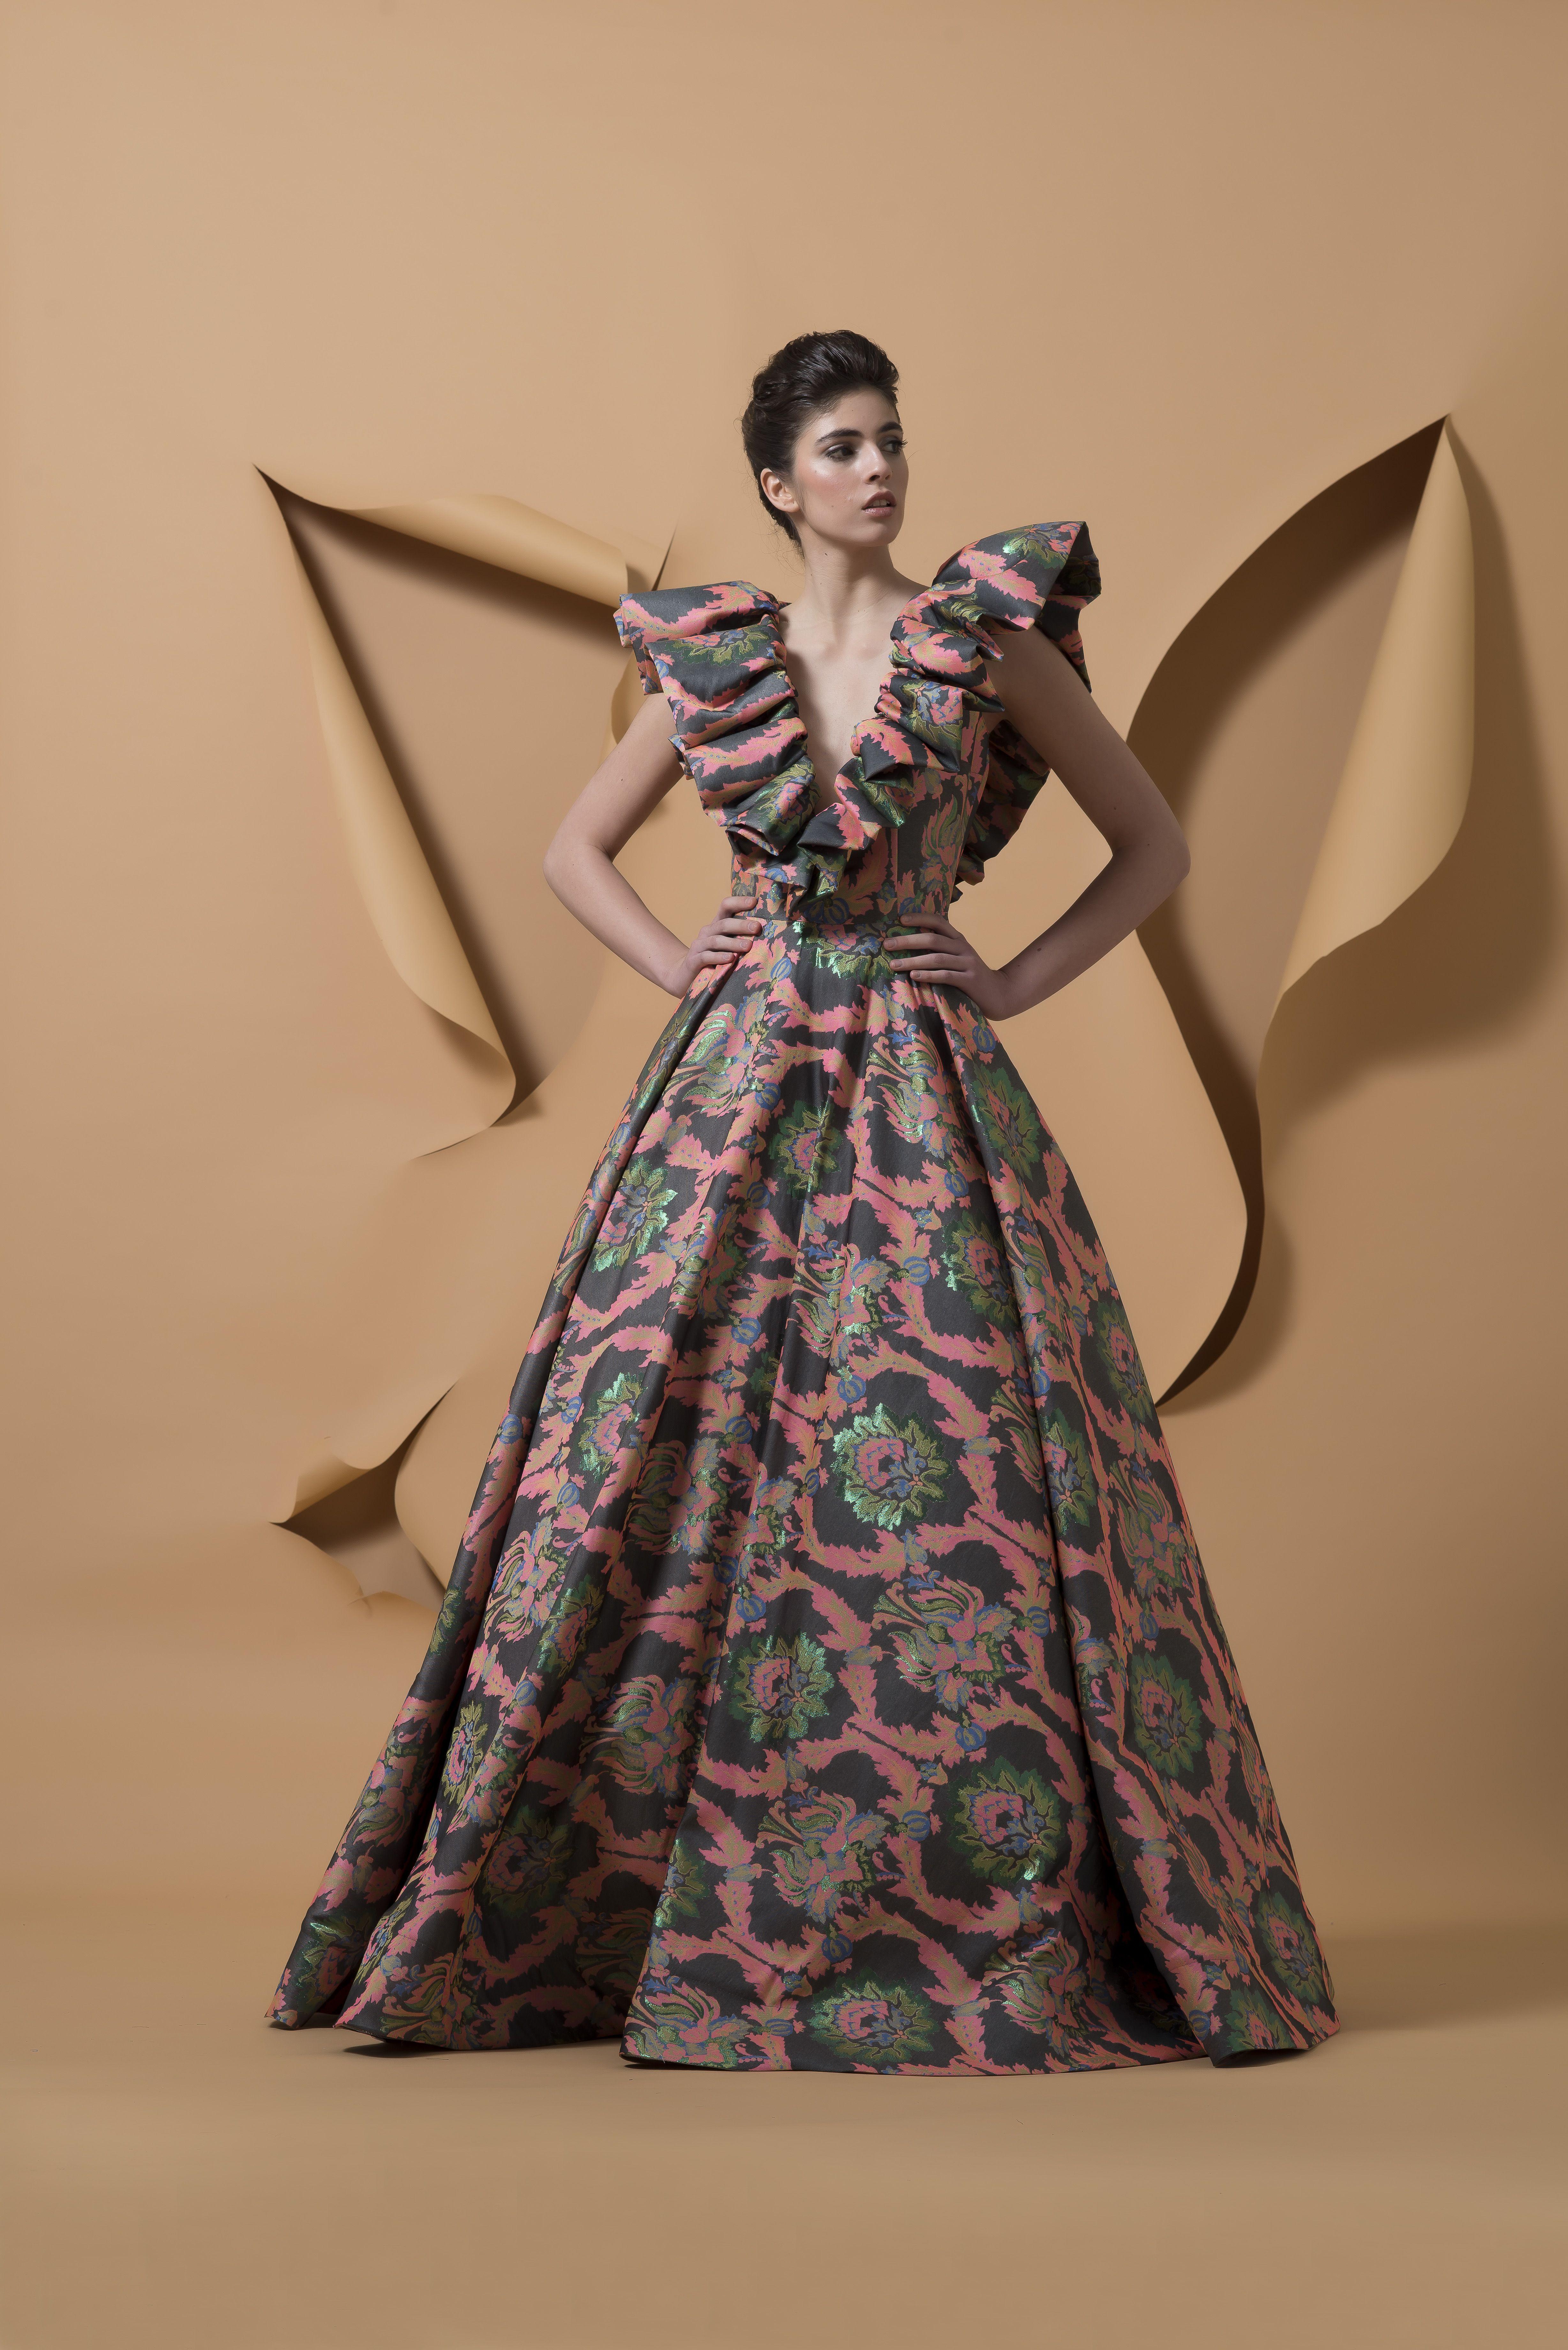 c9f3a6ba1cd Bride Dress Shop In Dubai - Gomes Weine AG